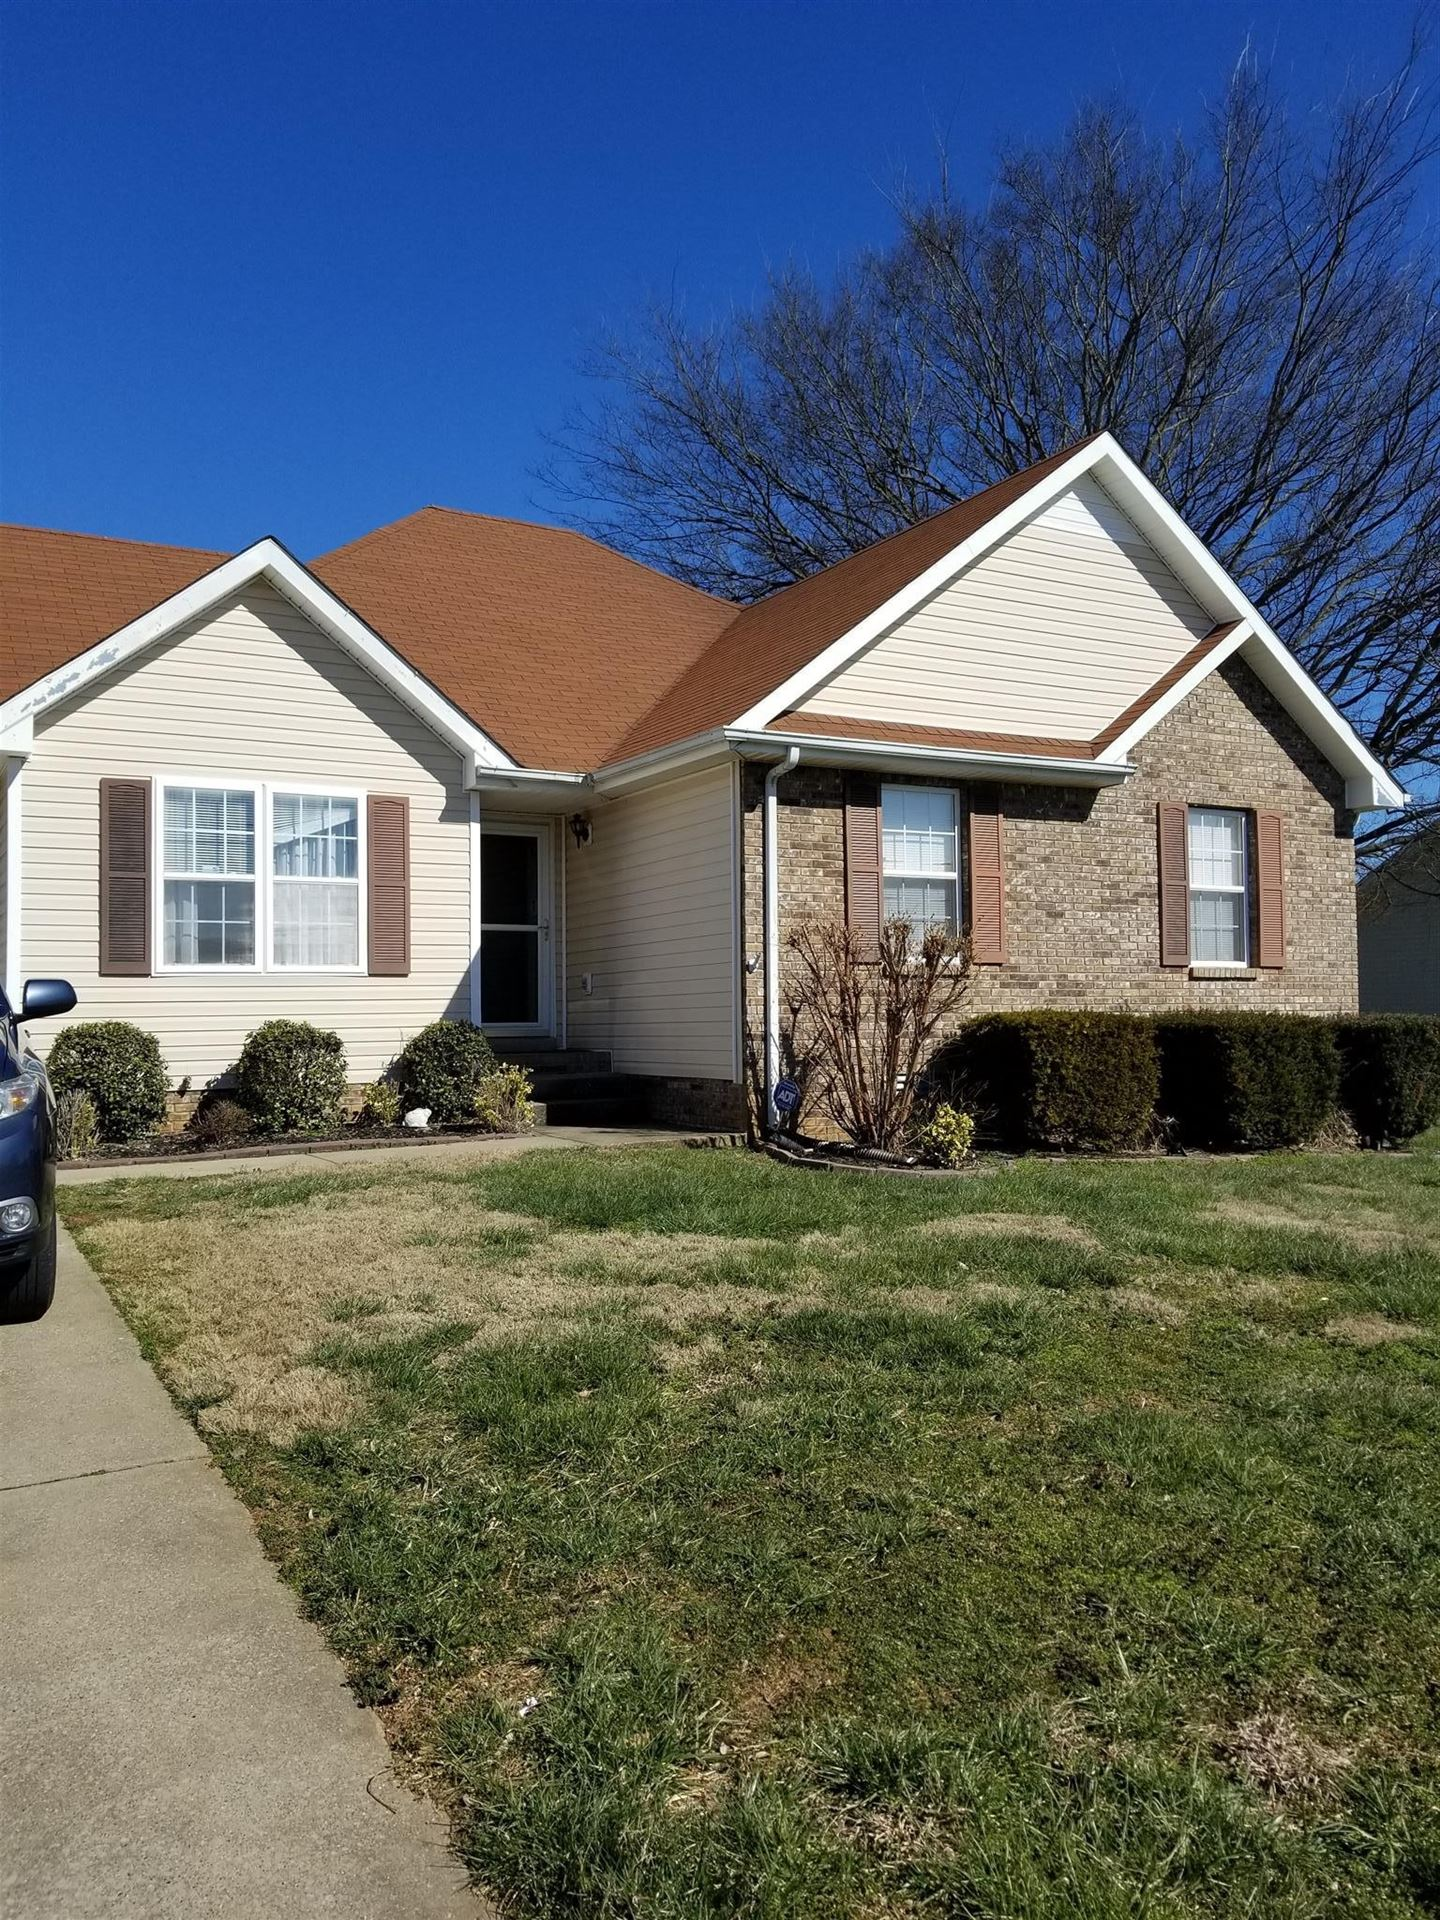 1363 Jenny Ln, Clarksville, TN 37042 - MLS#: 2281376